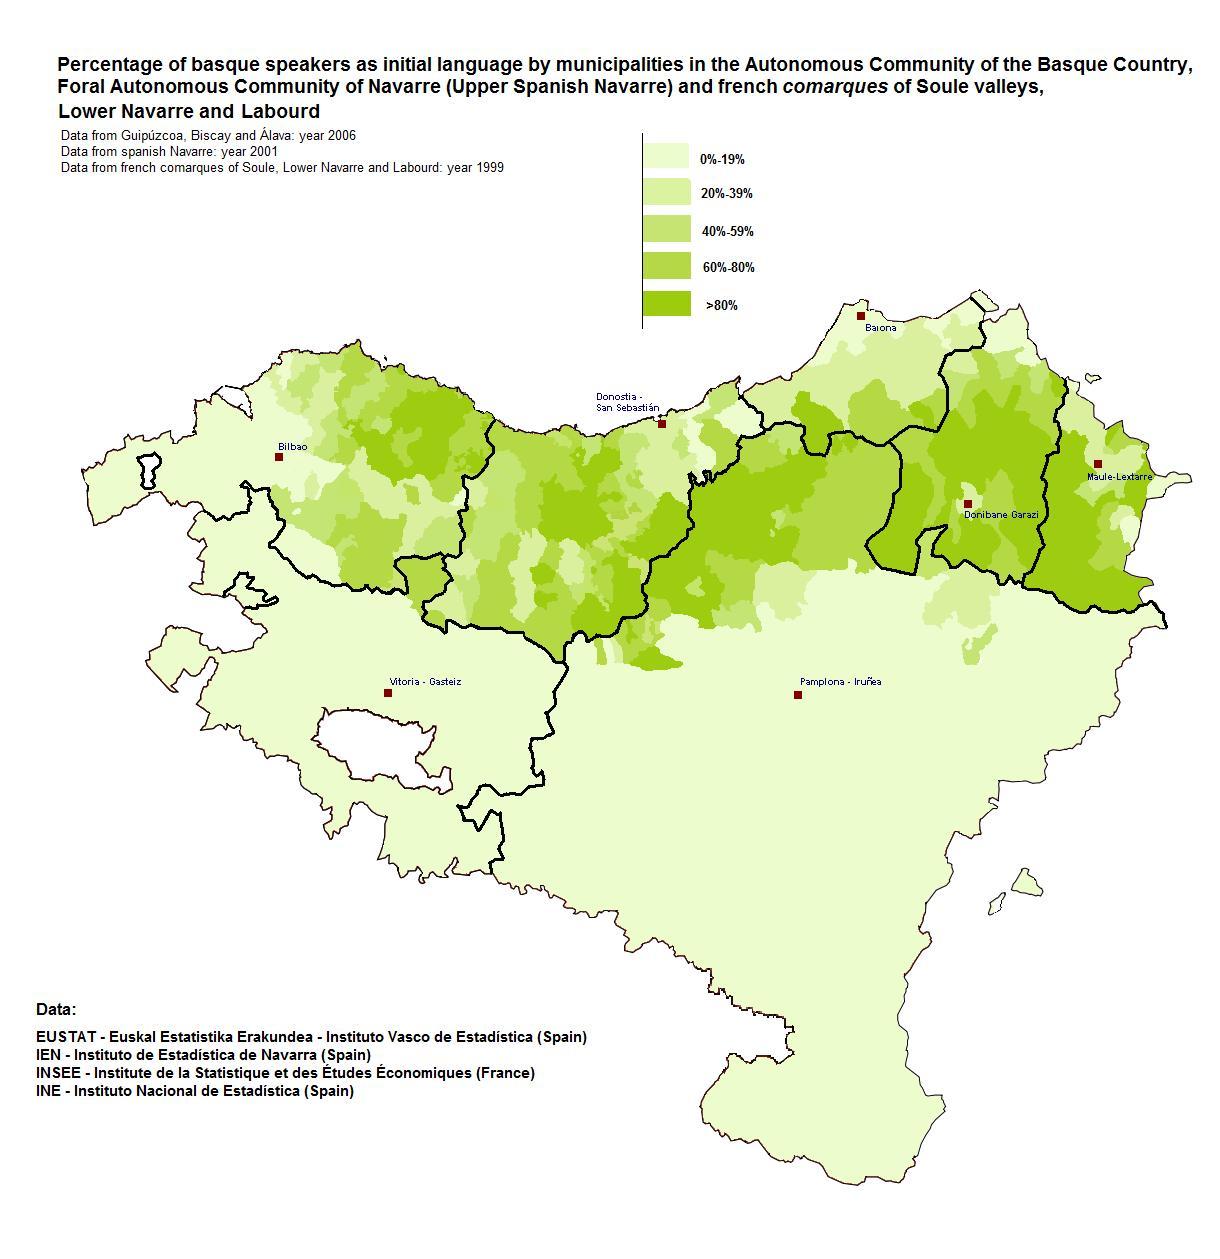 Family transmission of Basque language (Basque as initial language)